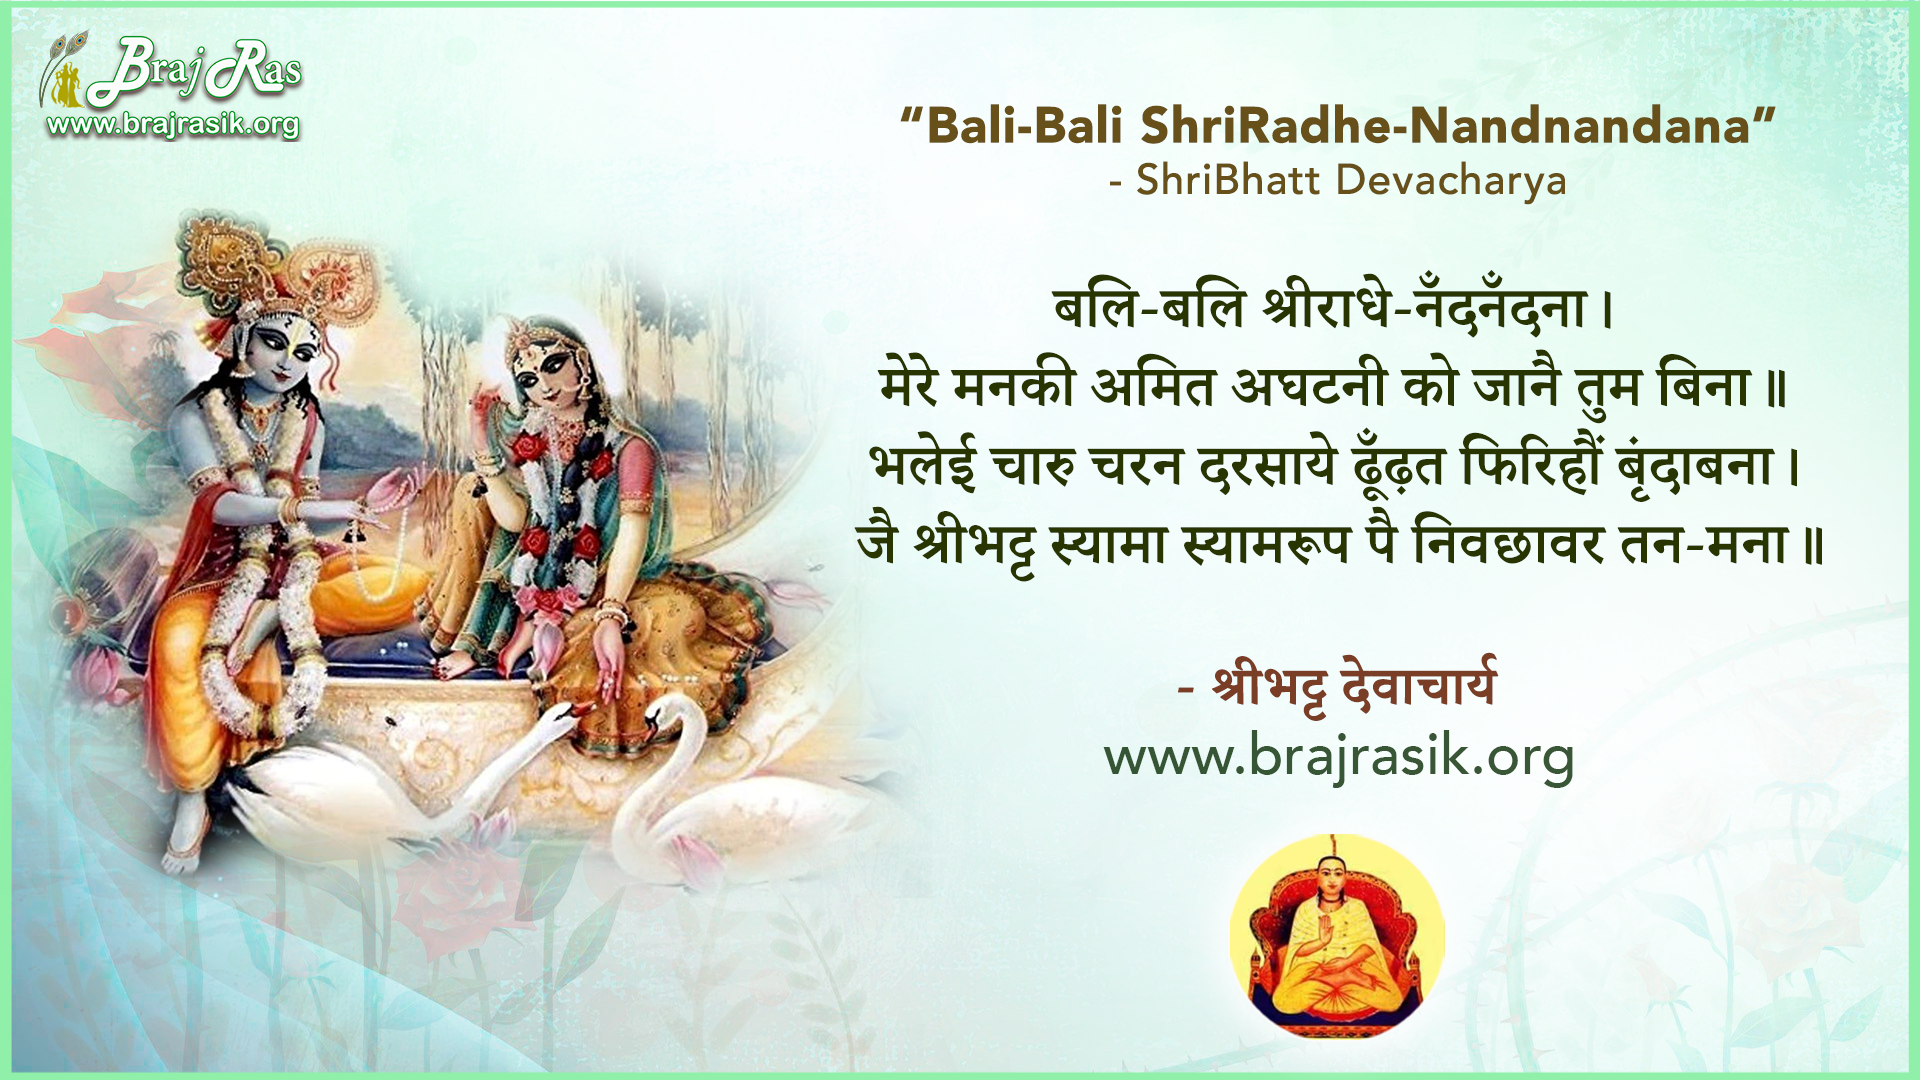 Bali-Bali ShriRadhe-Nandnandana - ShriBhatt Devacharya